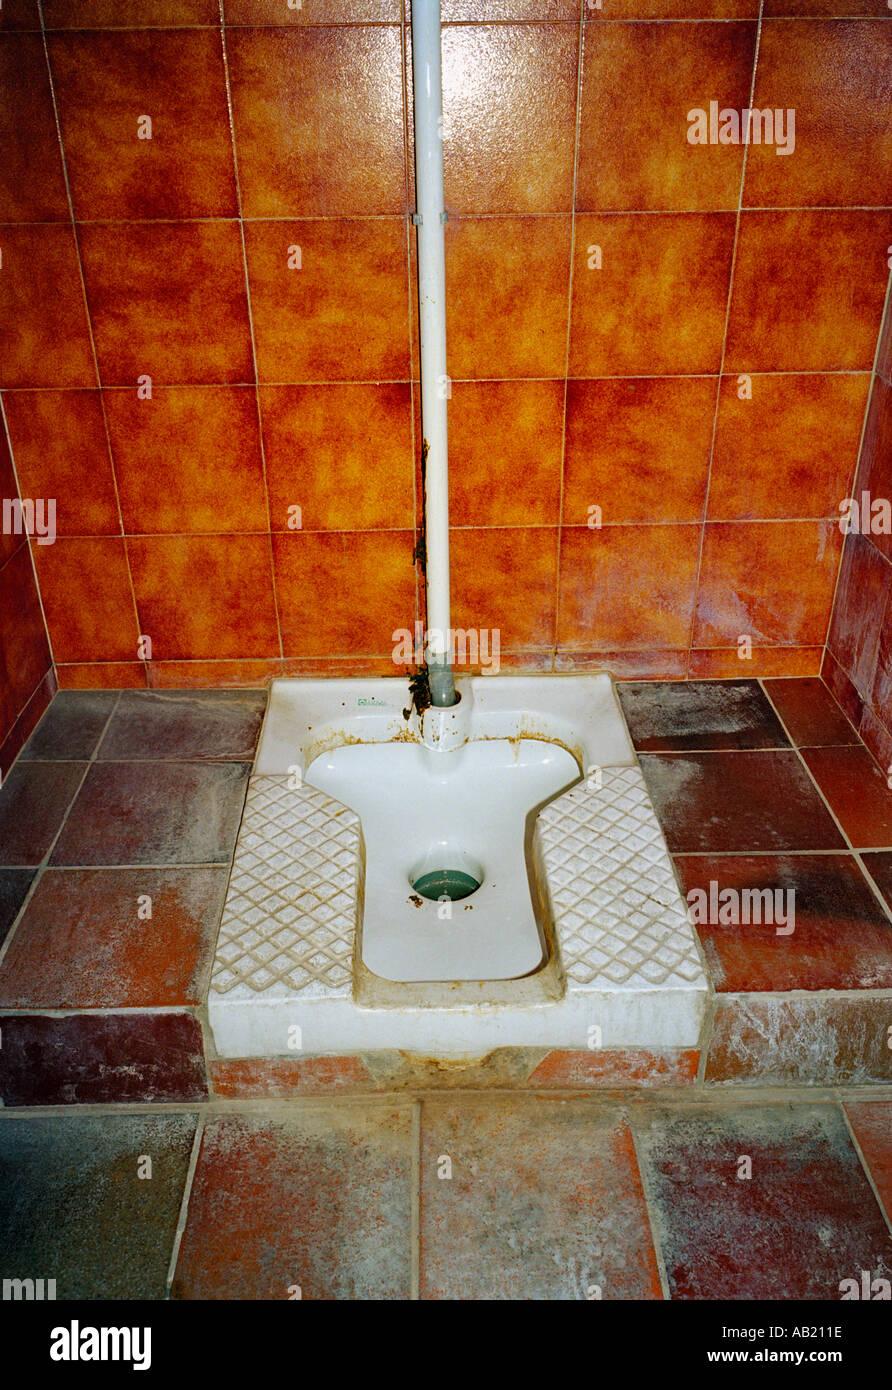 toilet france stock photos toilet france stock images alamy. Black Bedroom Furniture Sets. Home Design Ideas